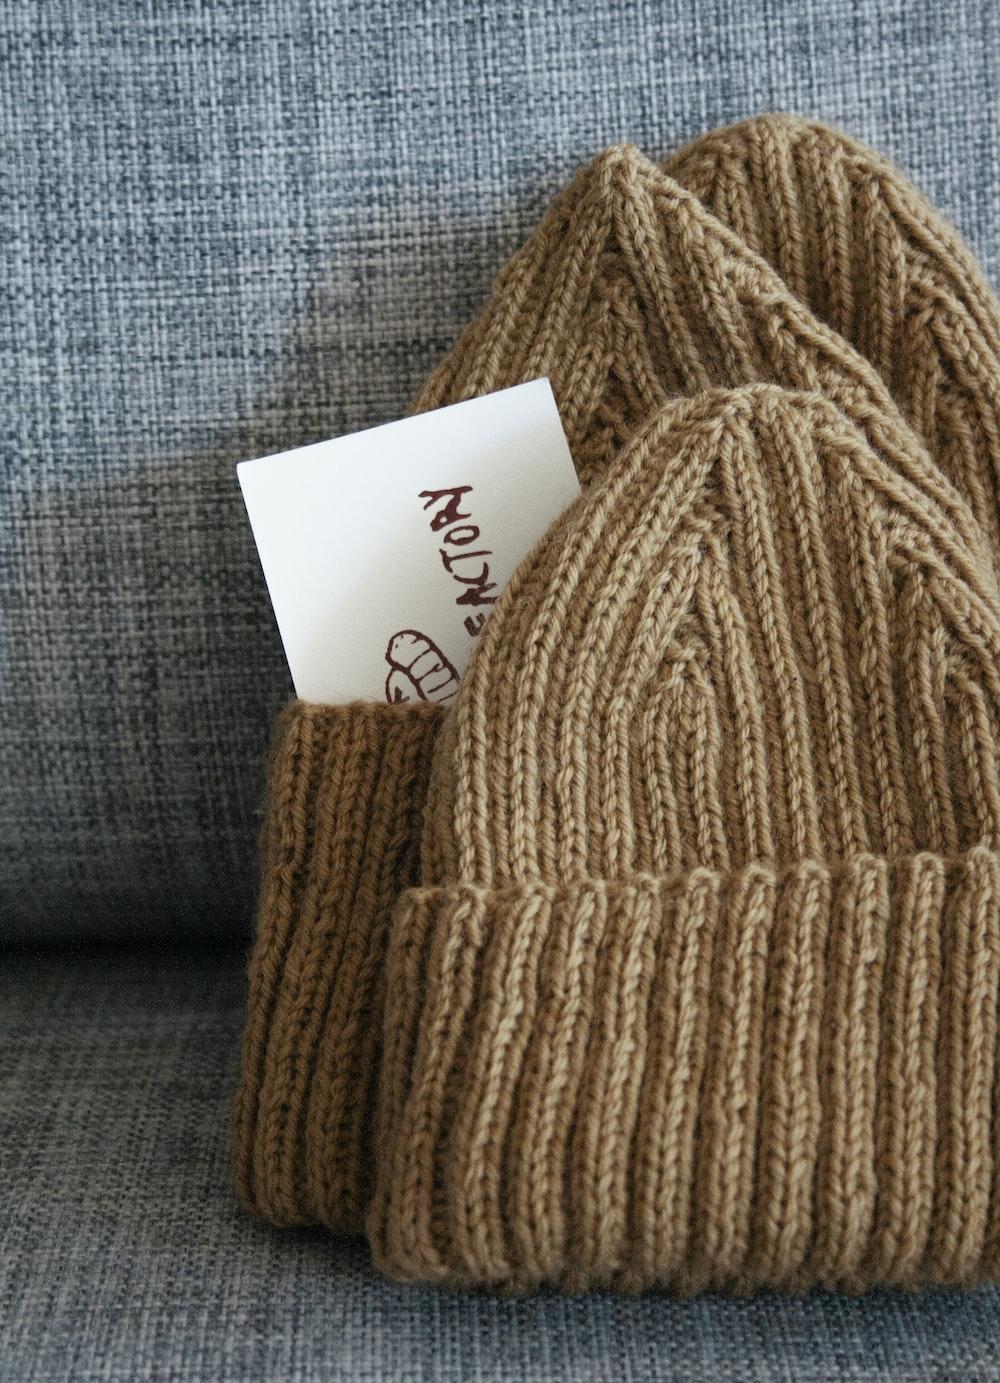 brown yarn on gray textile